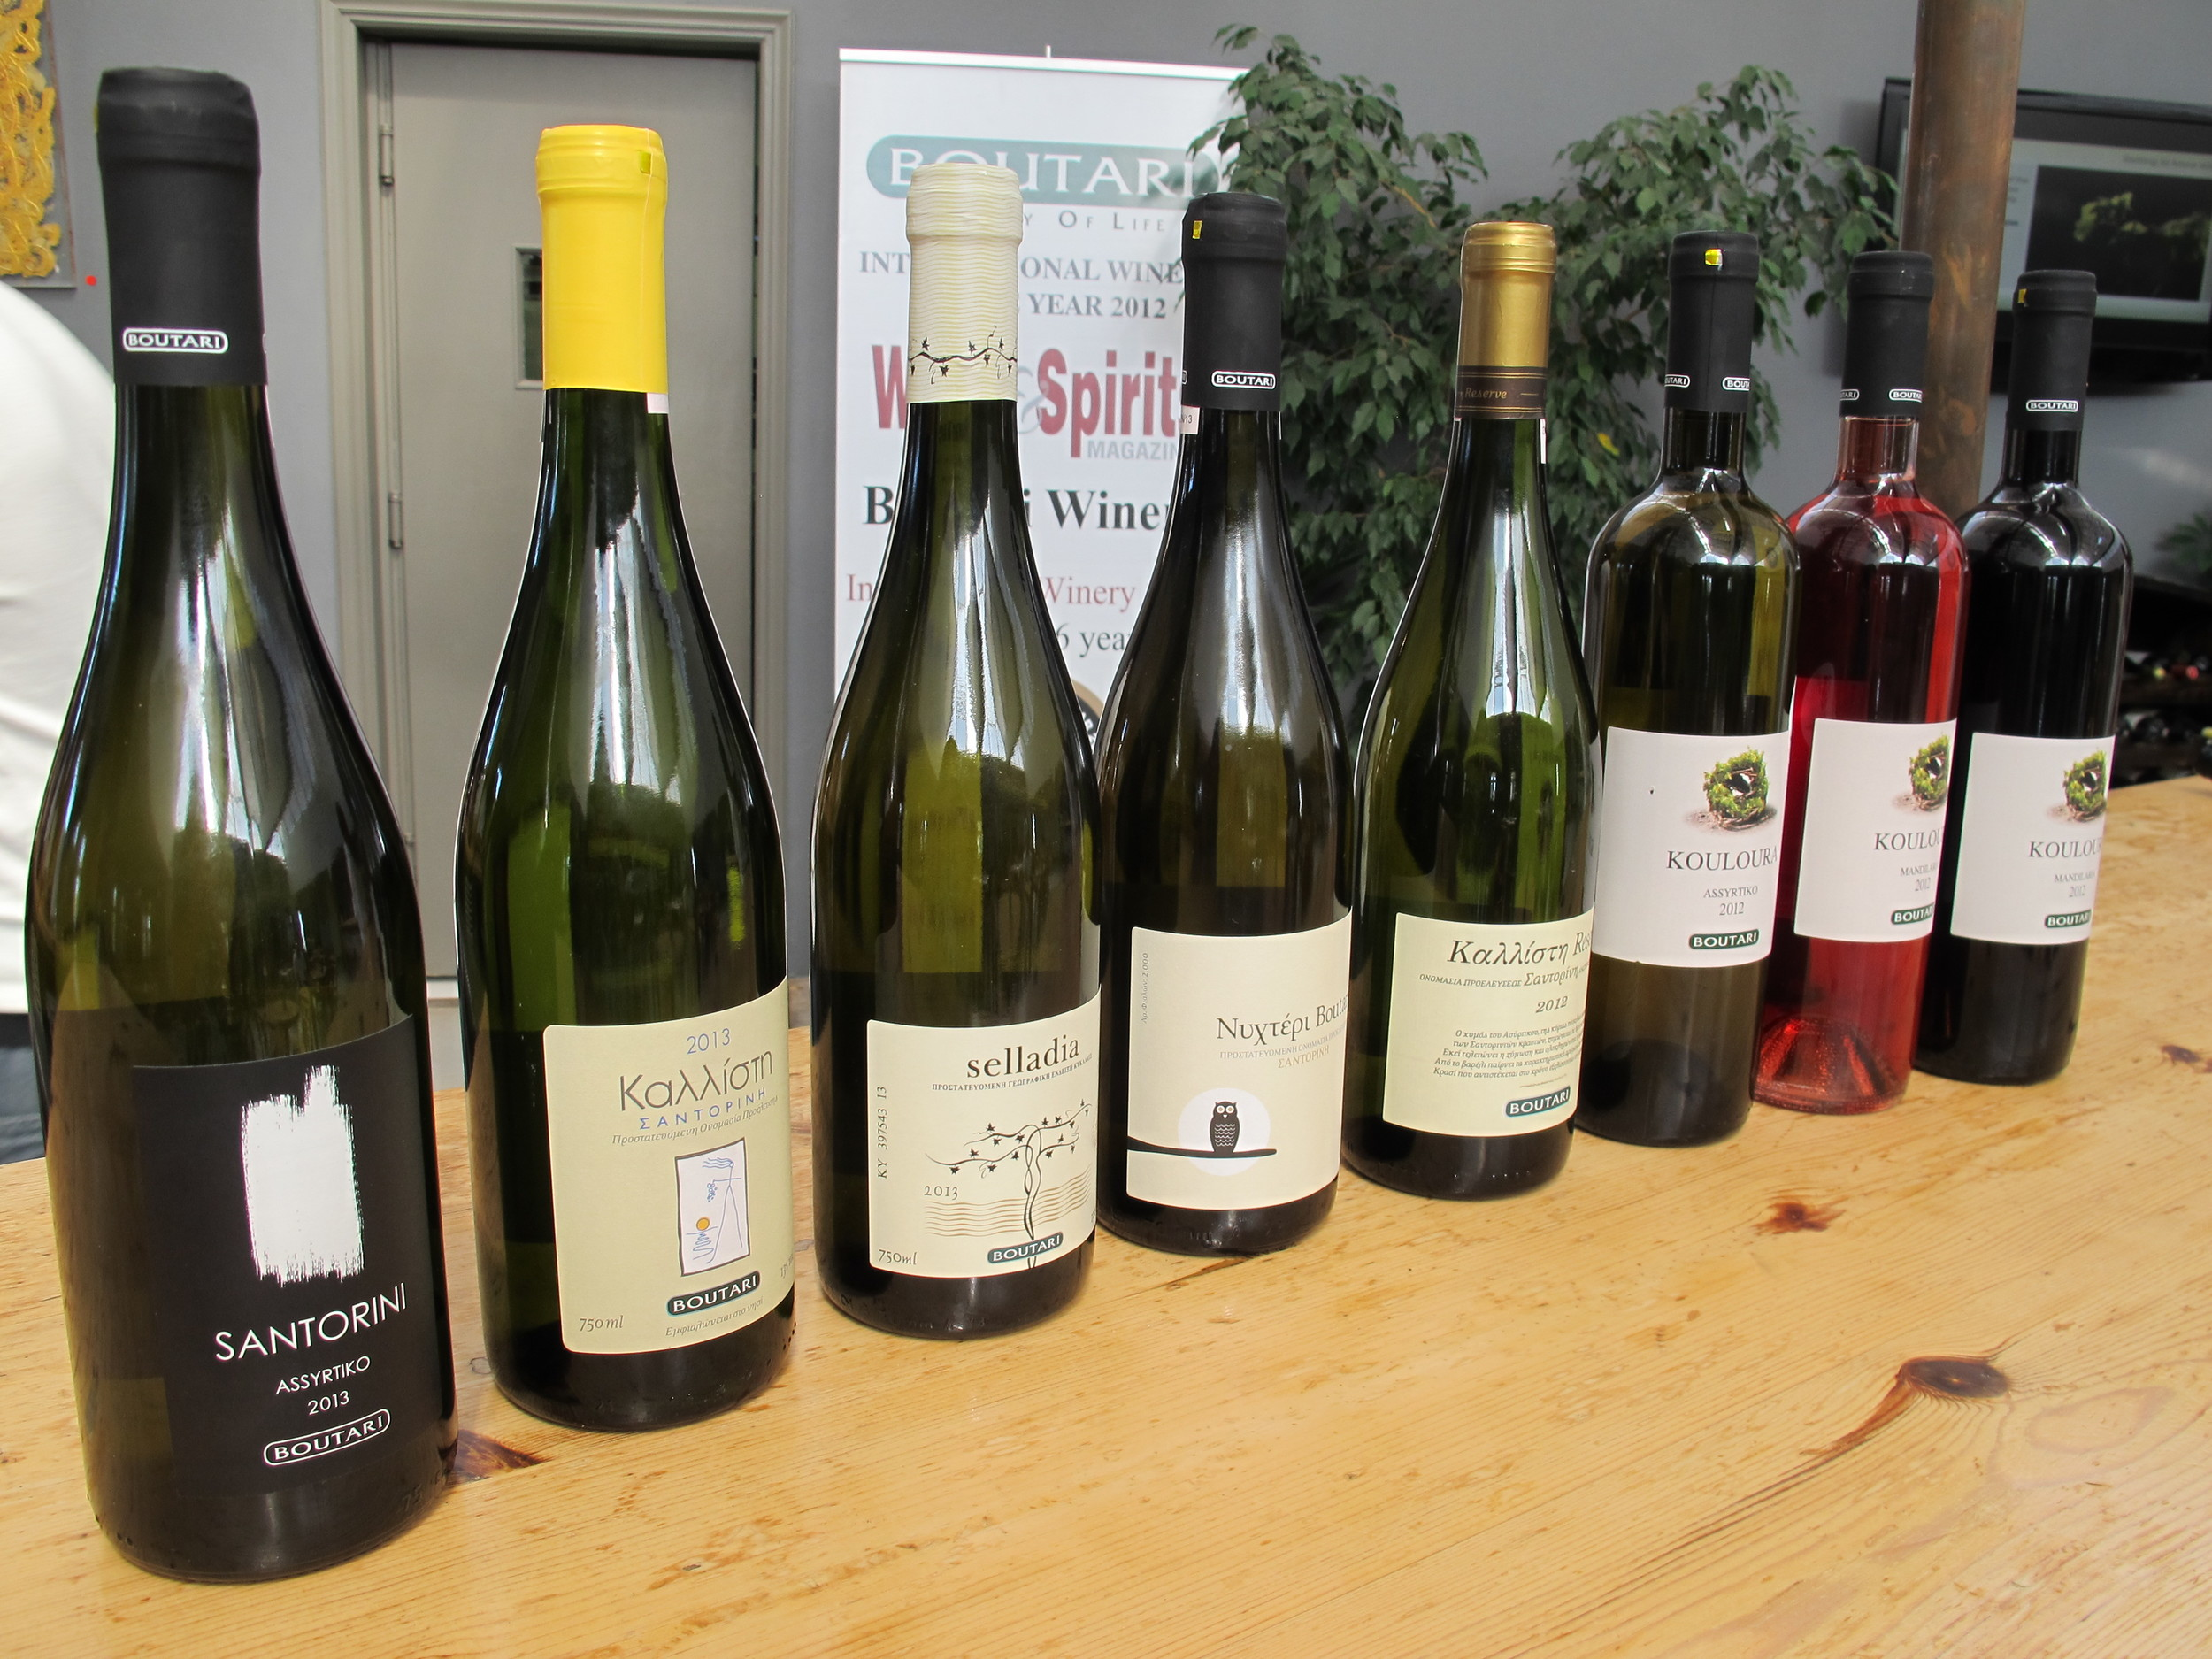 Boutari's Santorini wines.